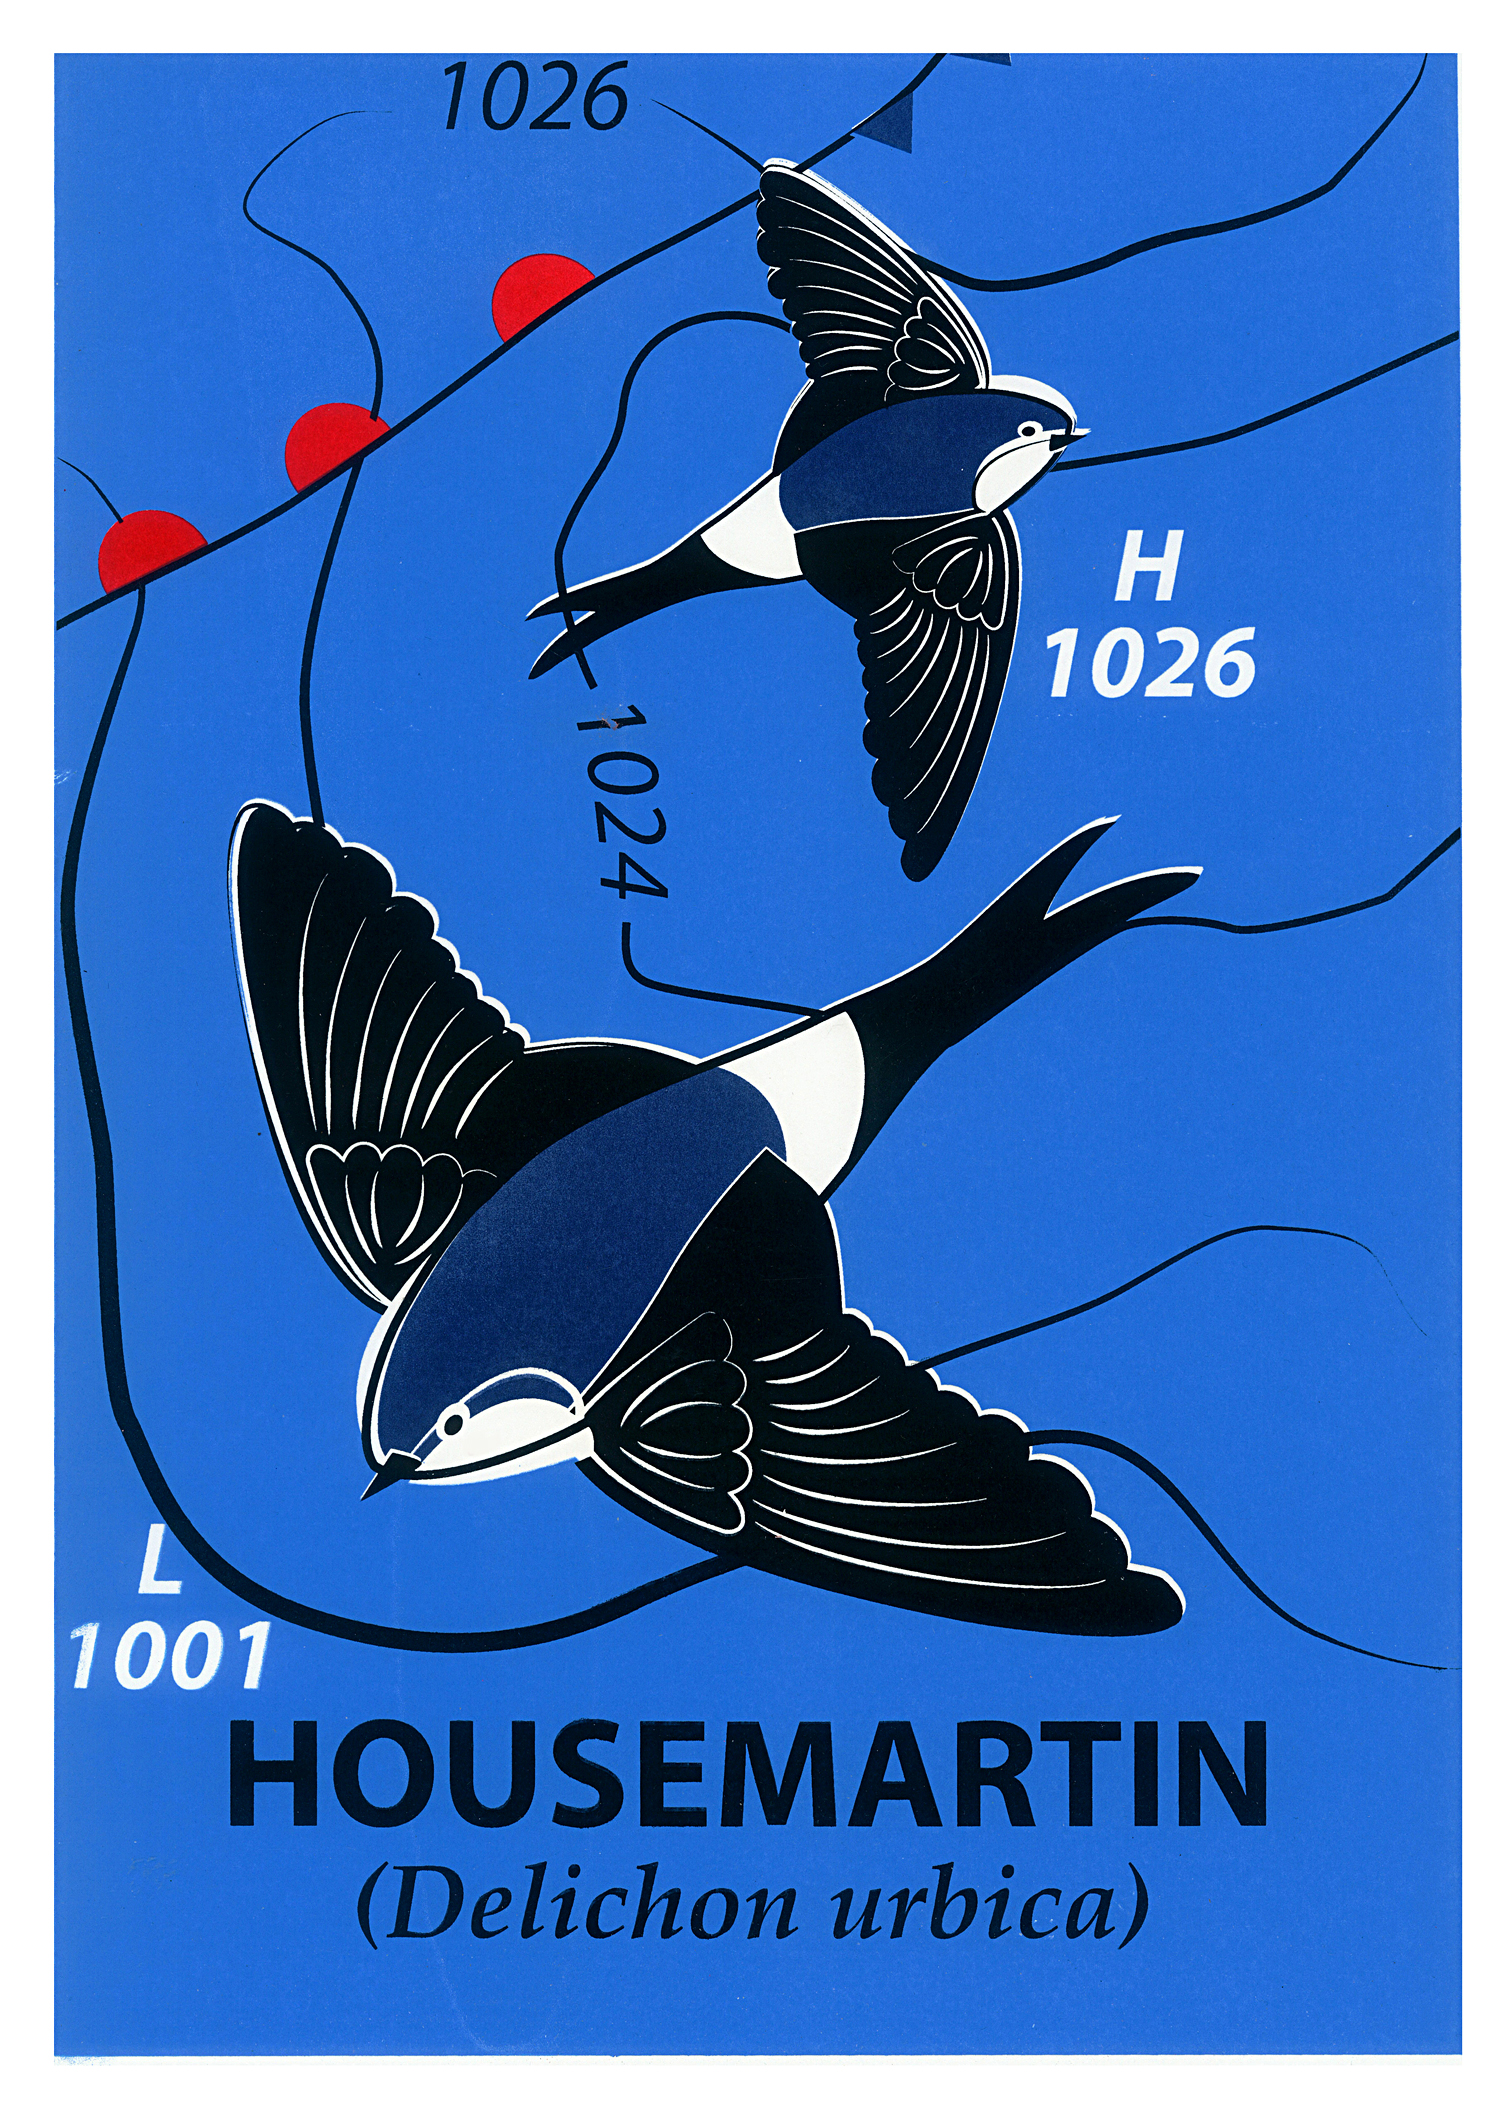 Limited Edition House Martin Screenprint